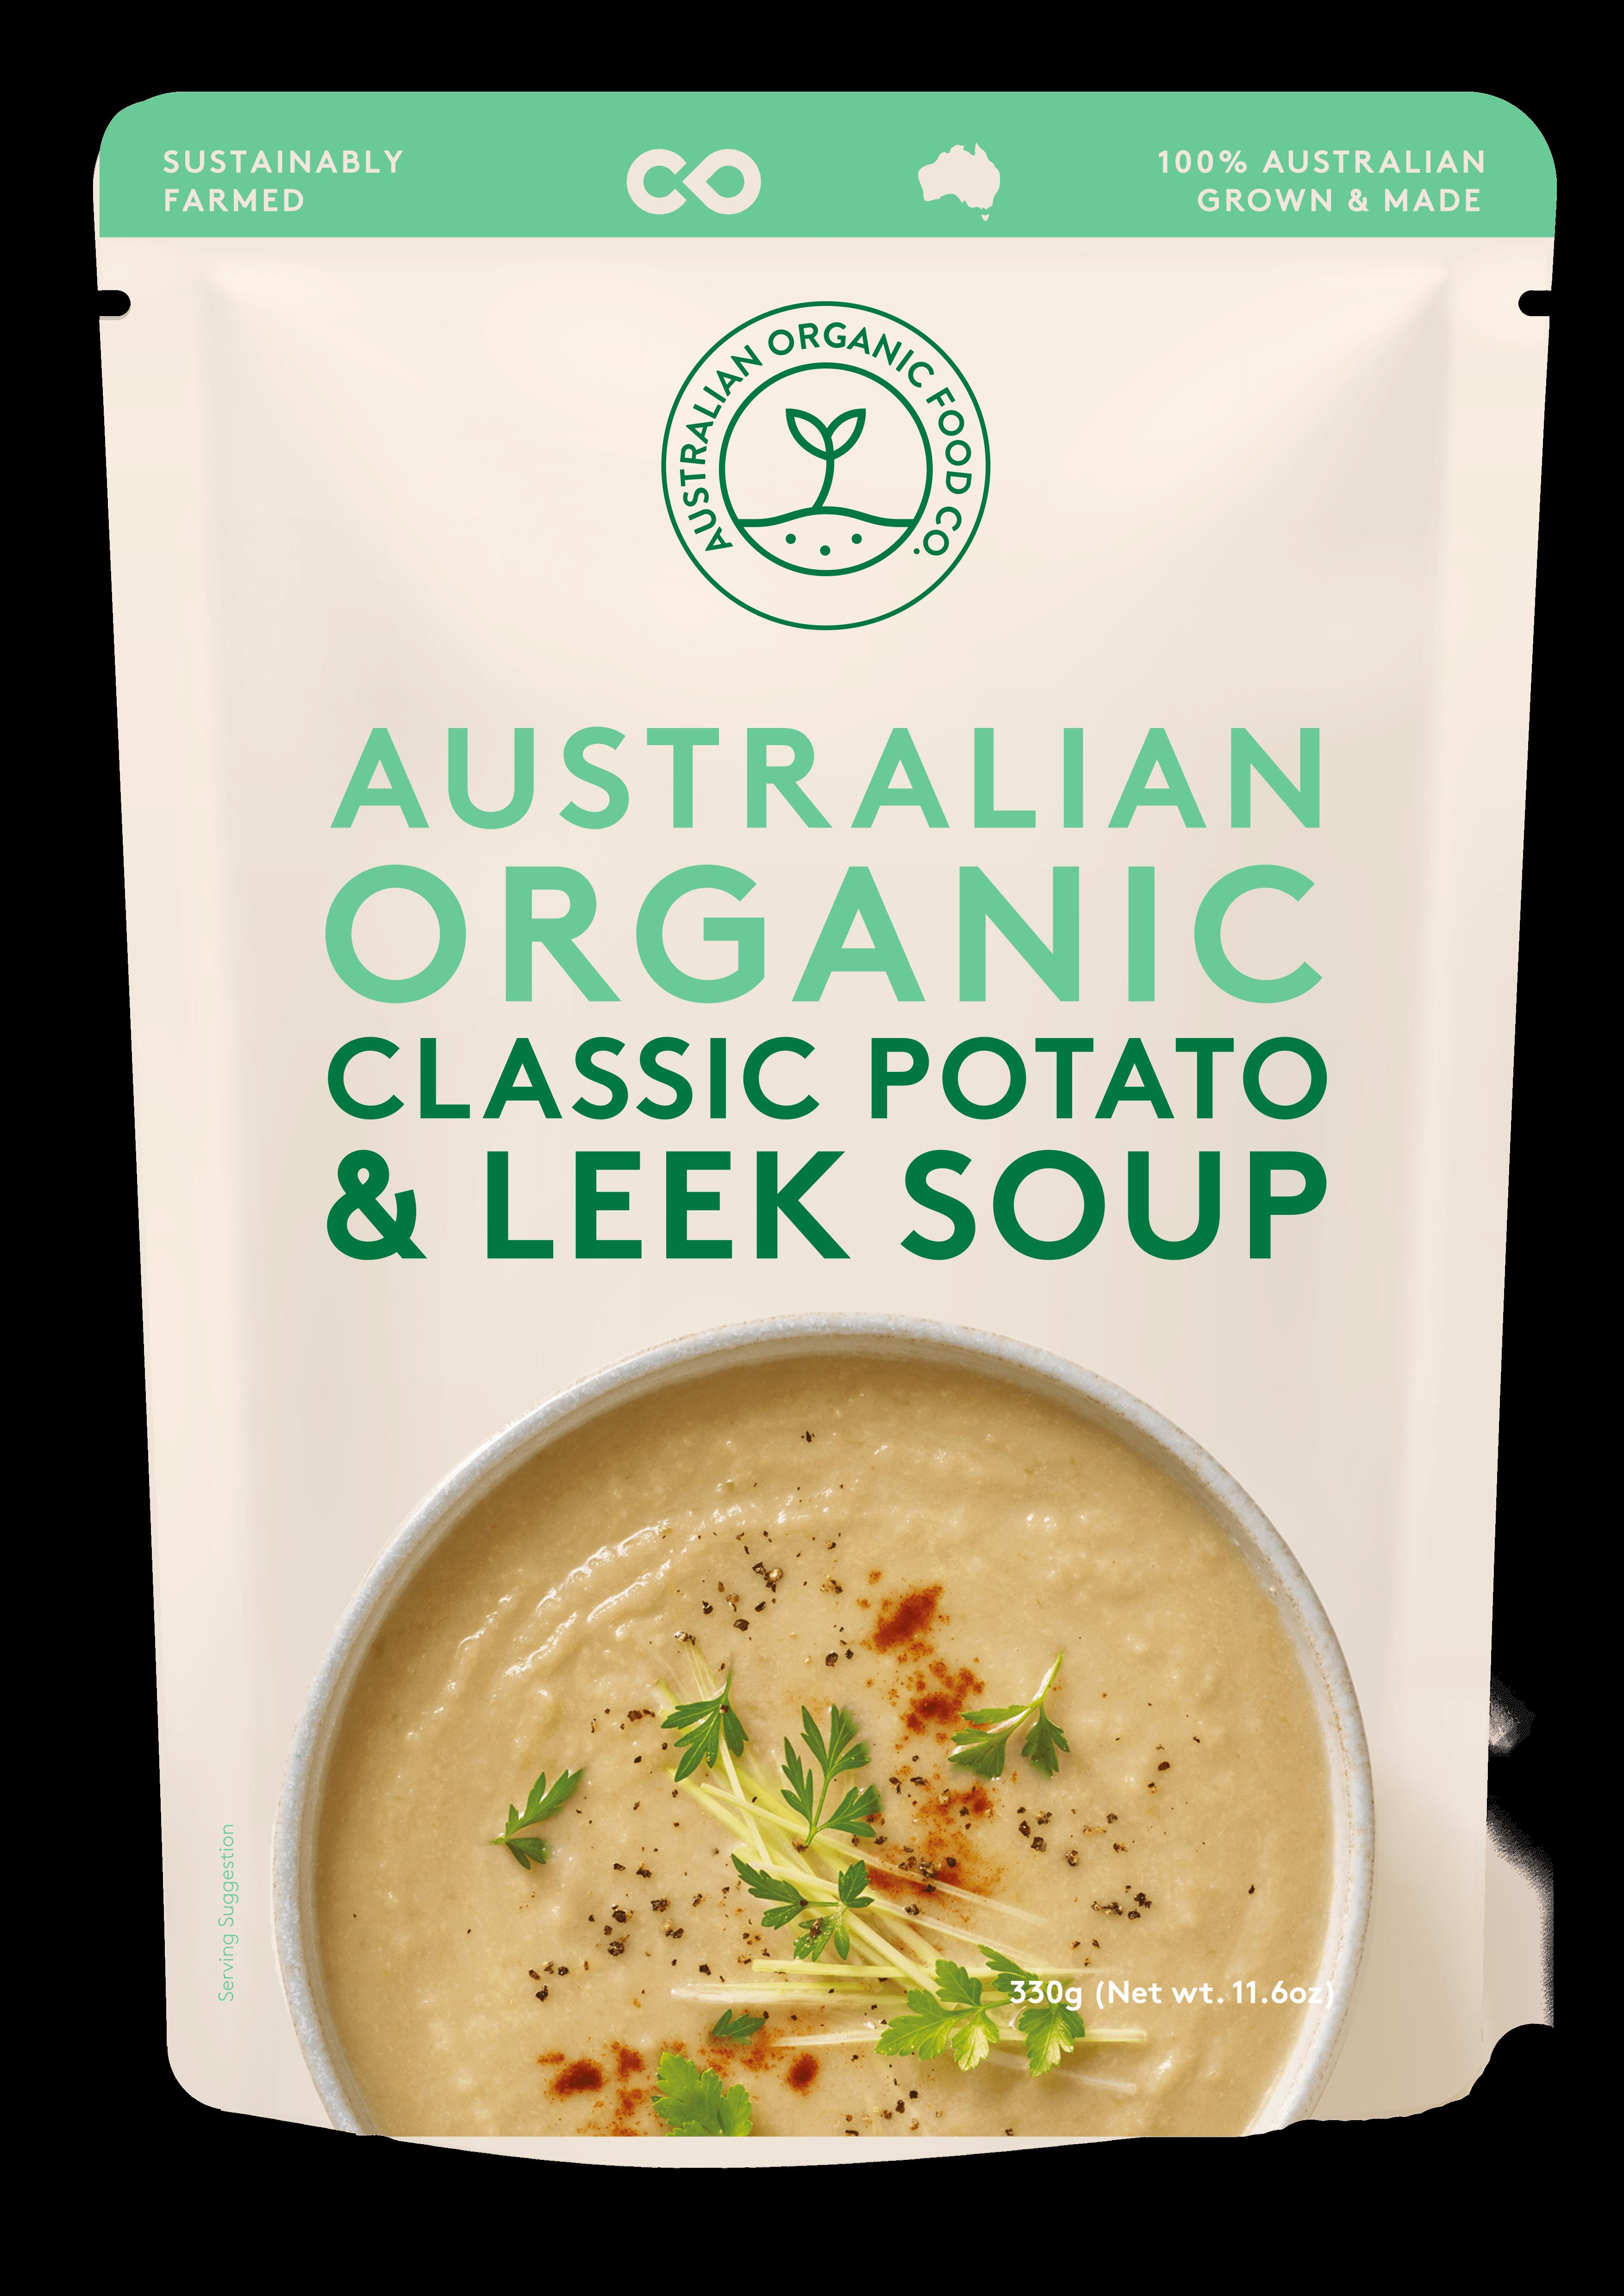 Potato & Leek Soup Package Image